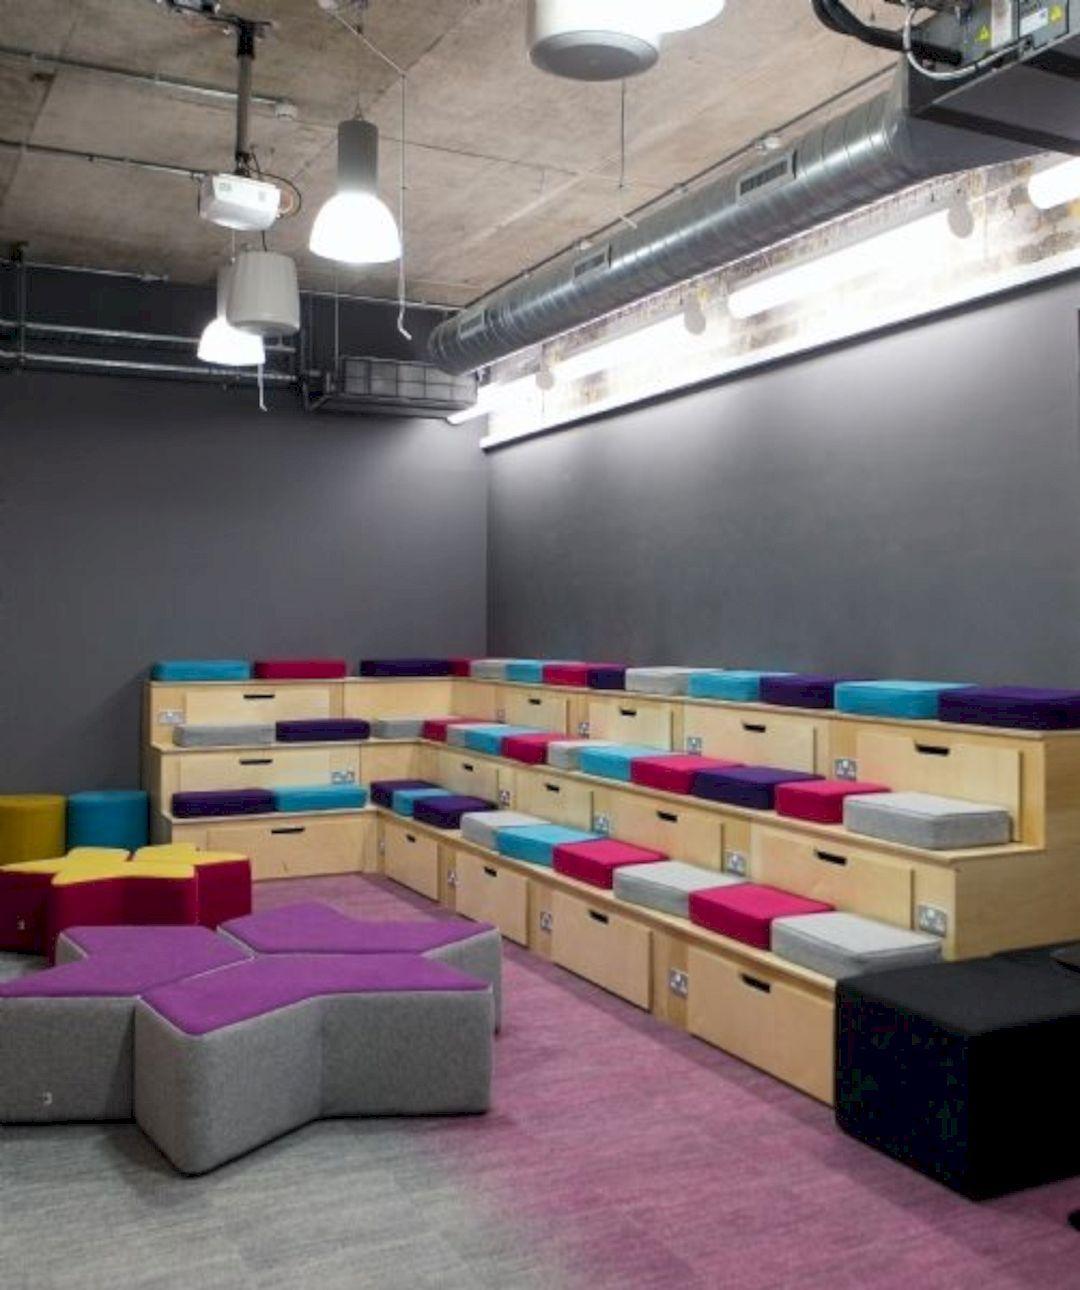 17 Interior Design Ideas For An Enjoyable Classroom